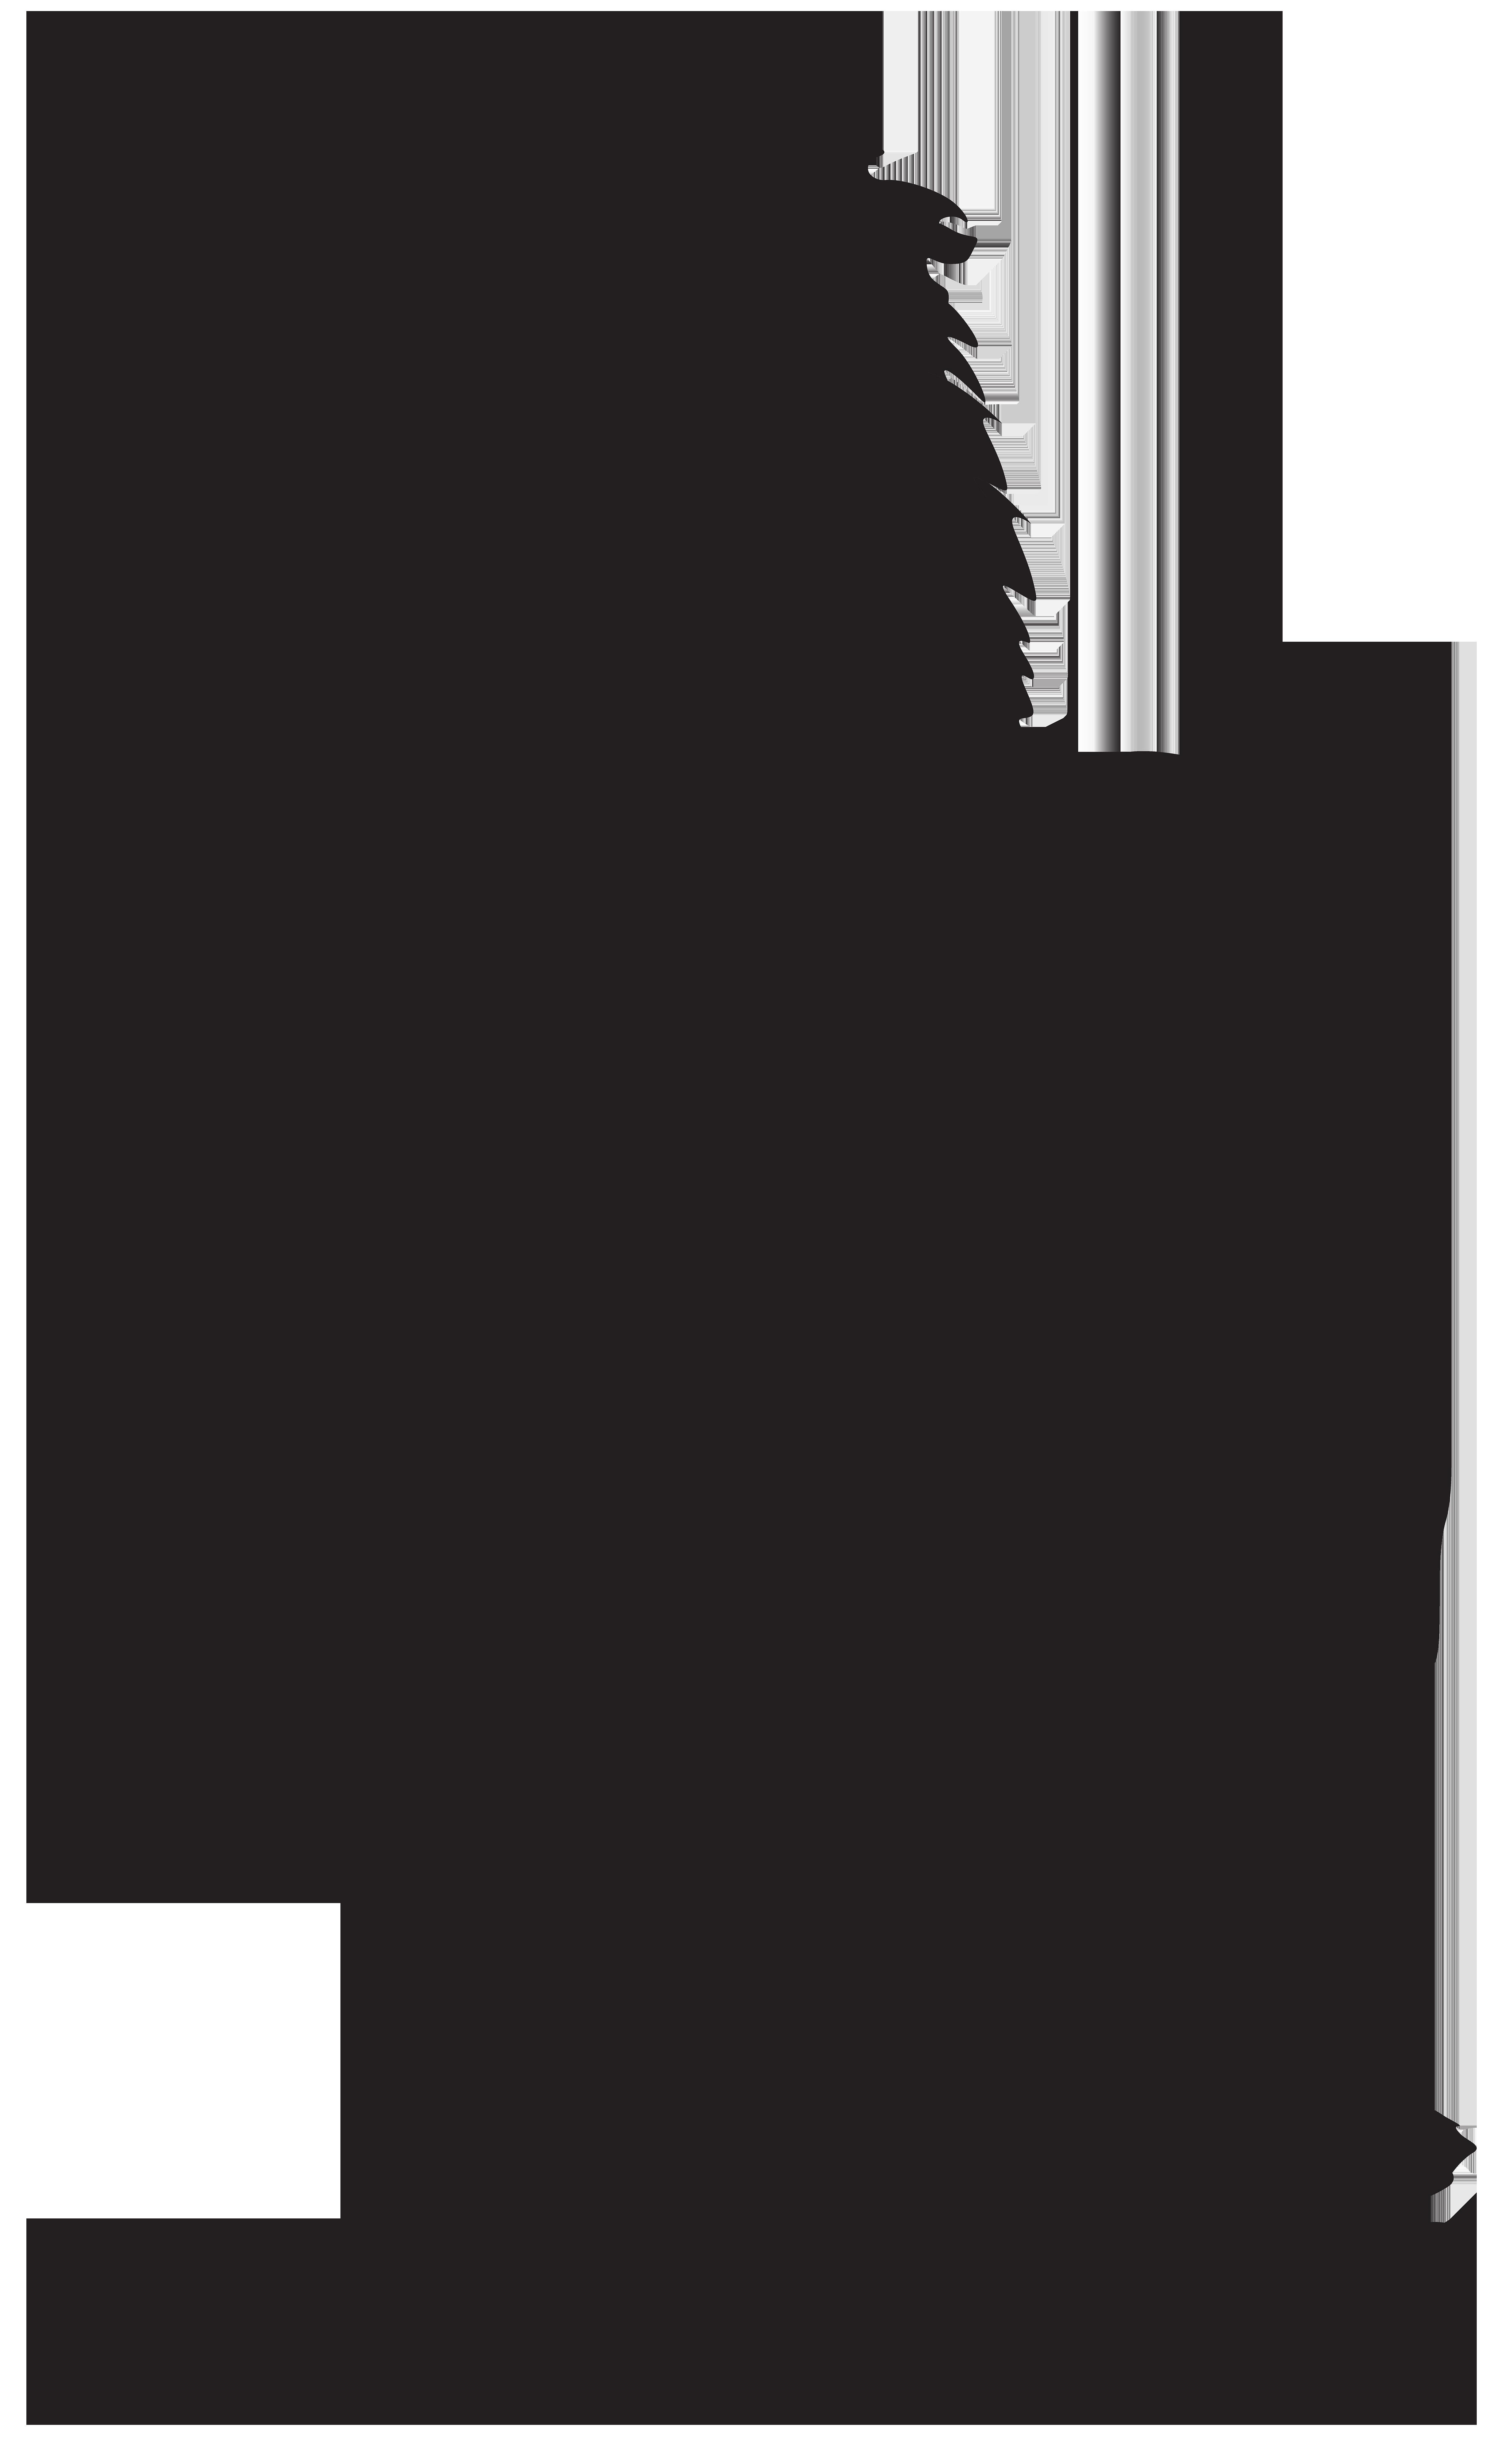 Lion Silhouette Png Transparent Clip Art Image Skiss Gor Det Sjalv Och Hantverk Akvareller